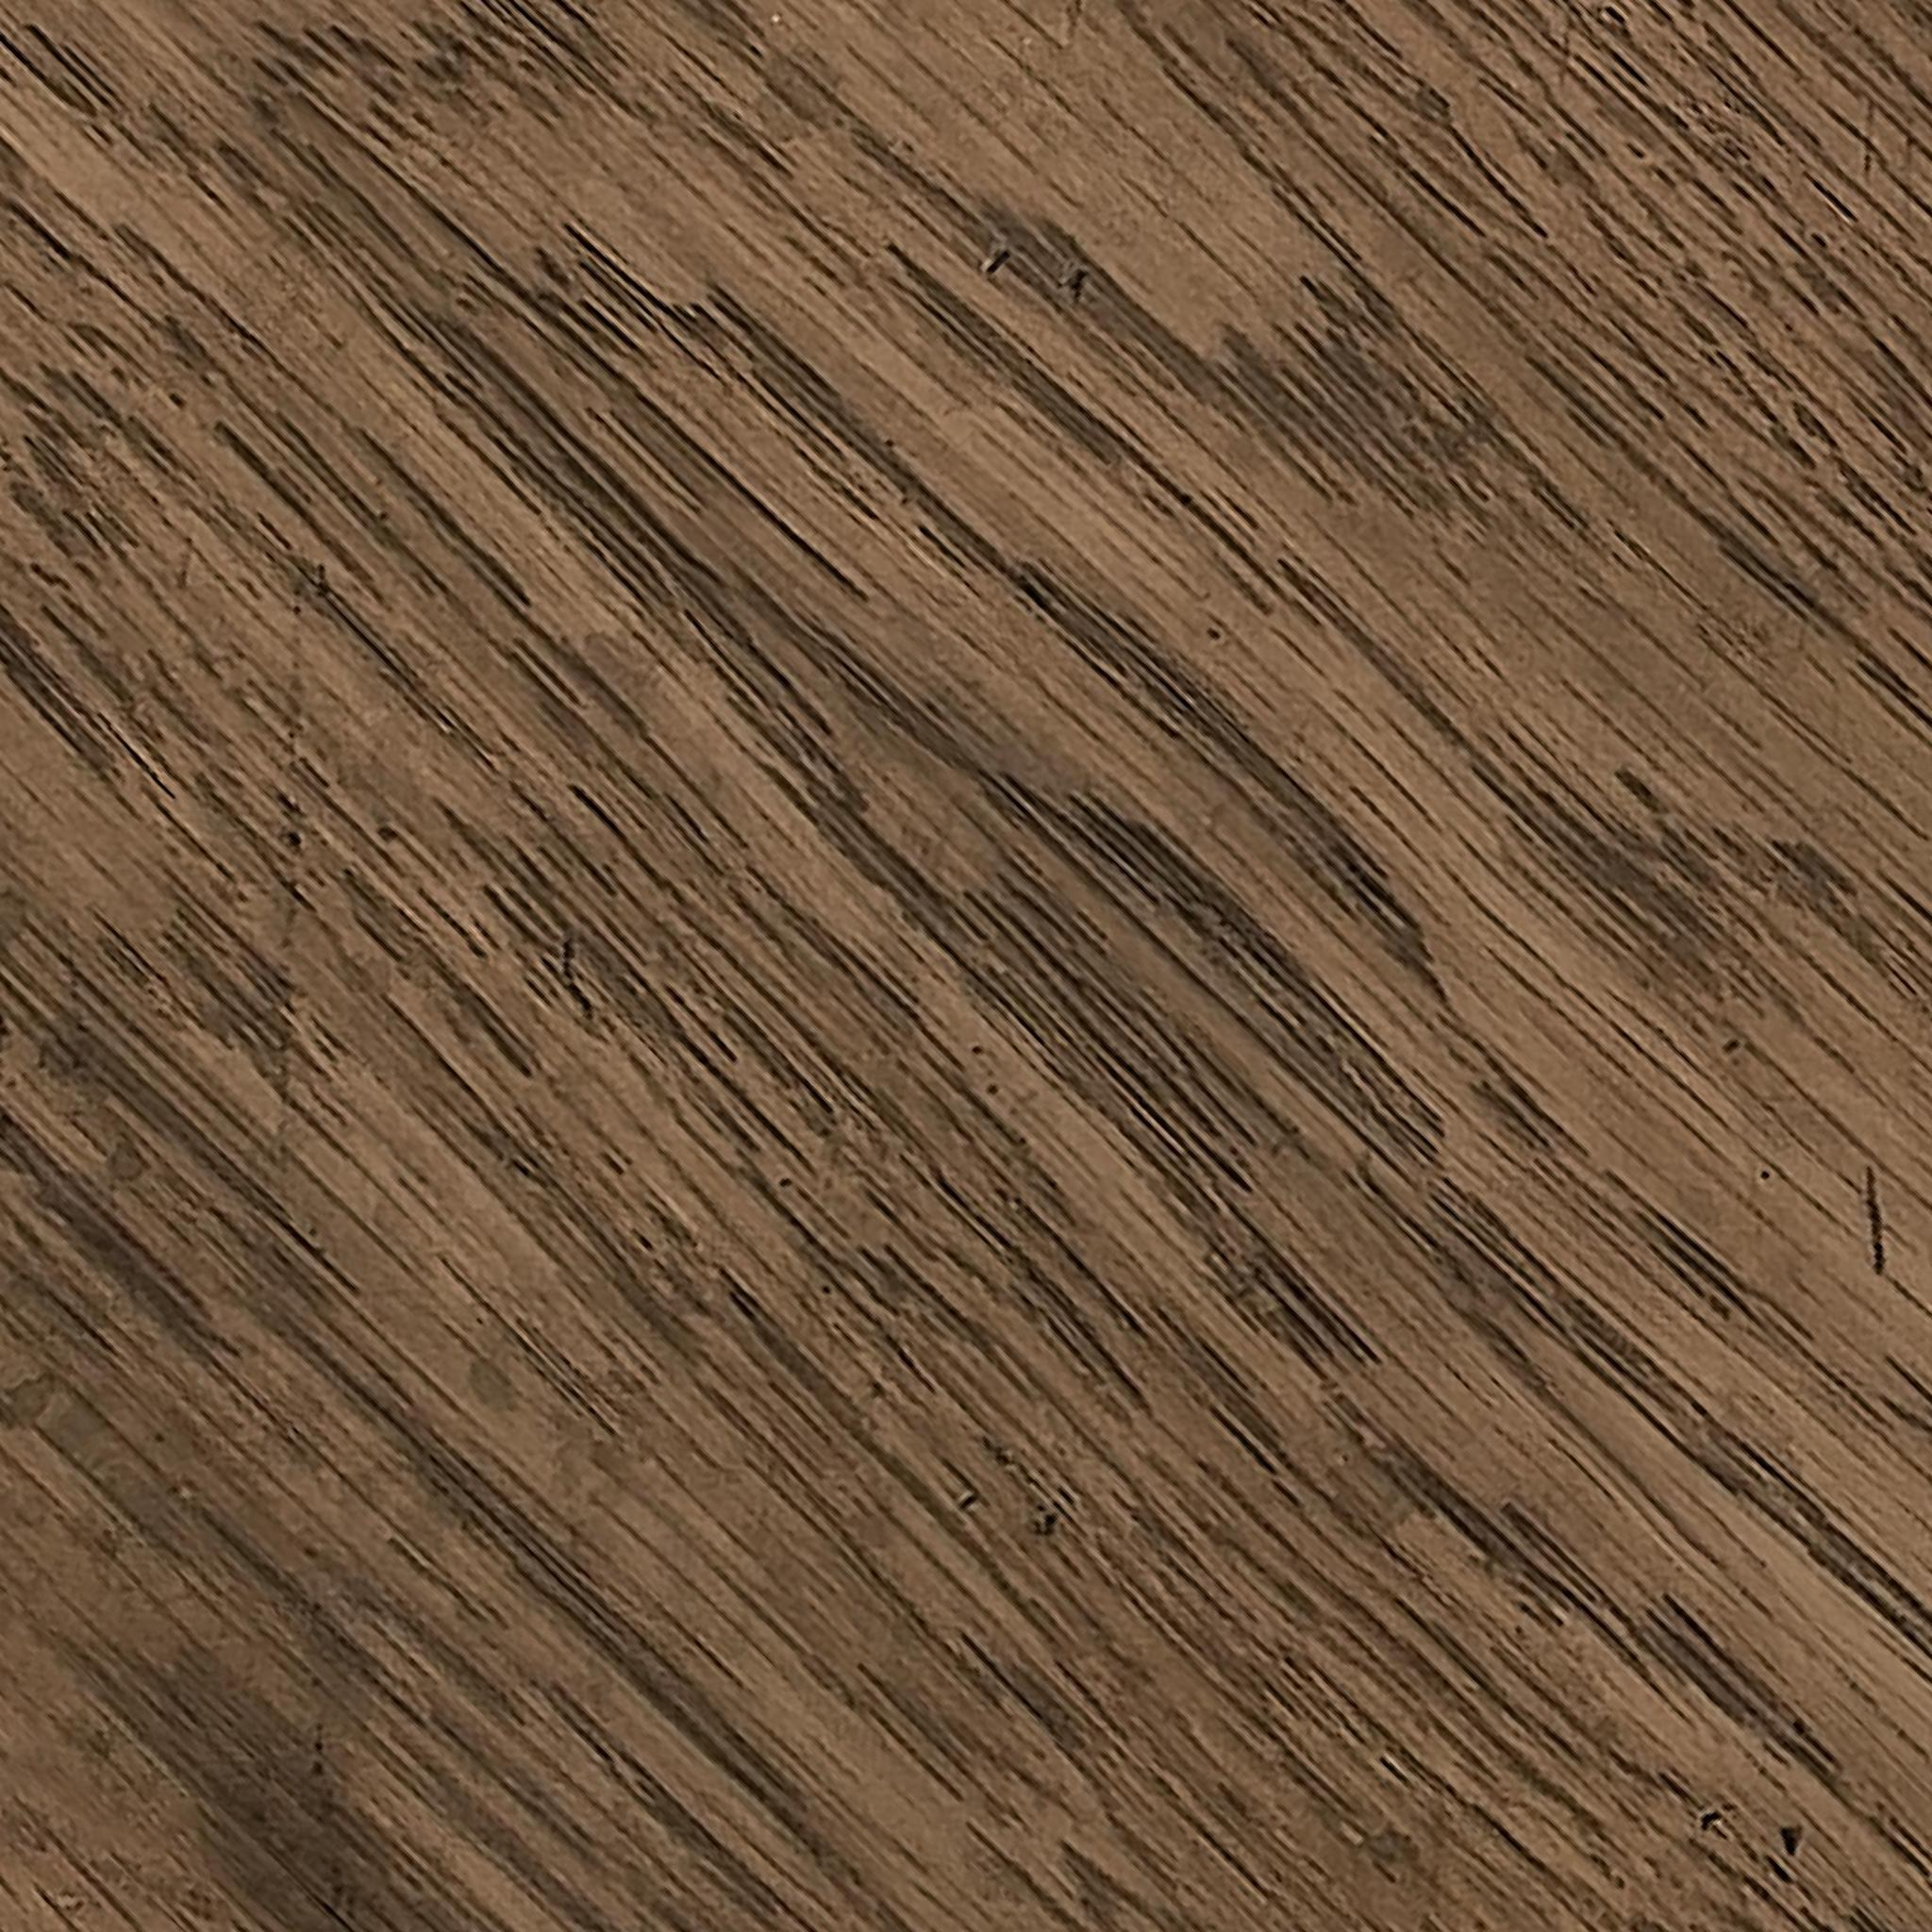 Wood Textures Vol 2 Rendernode